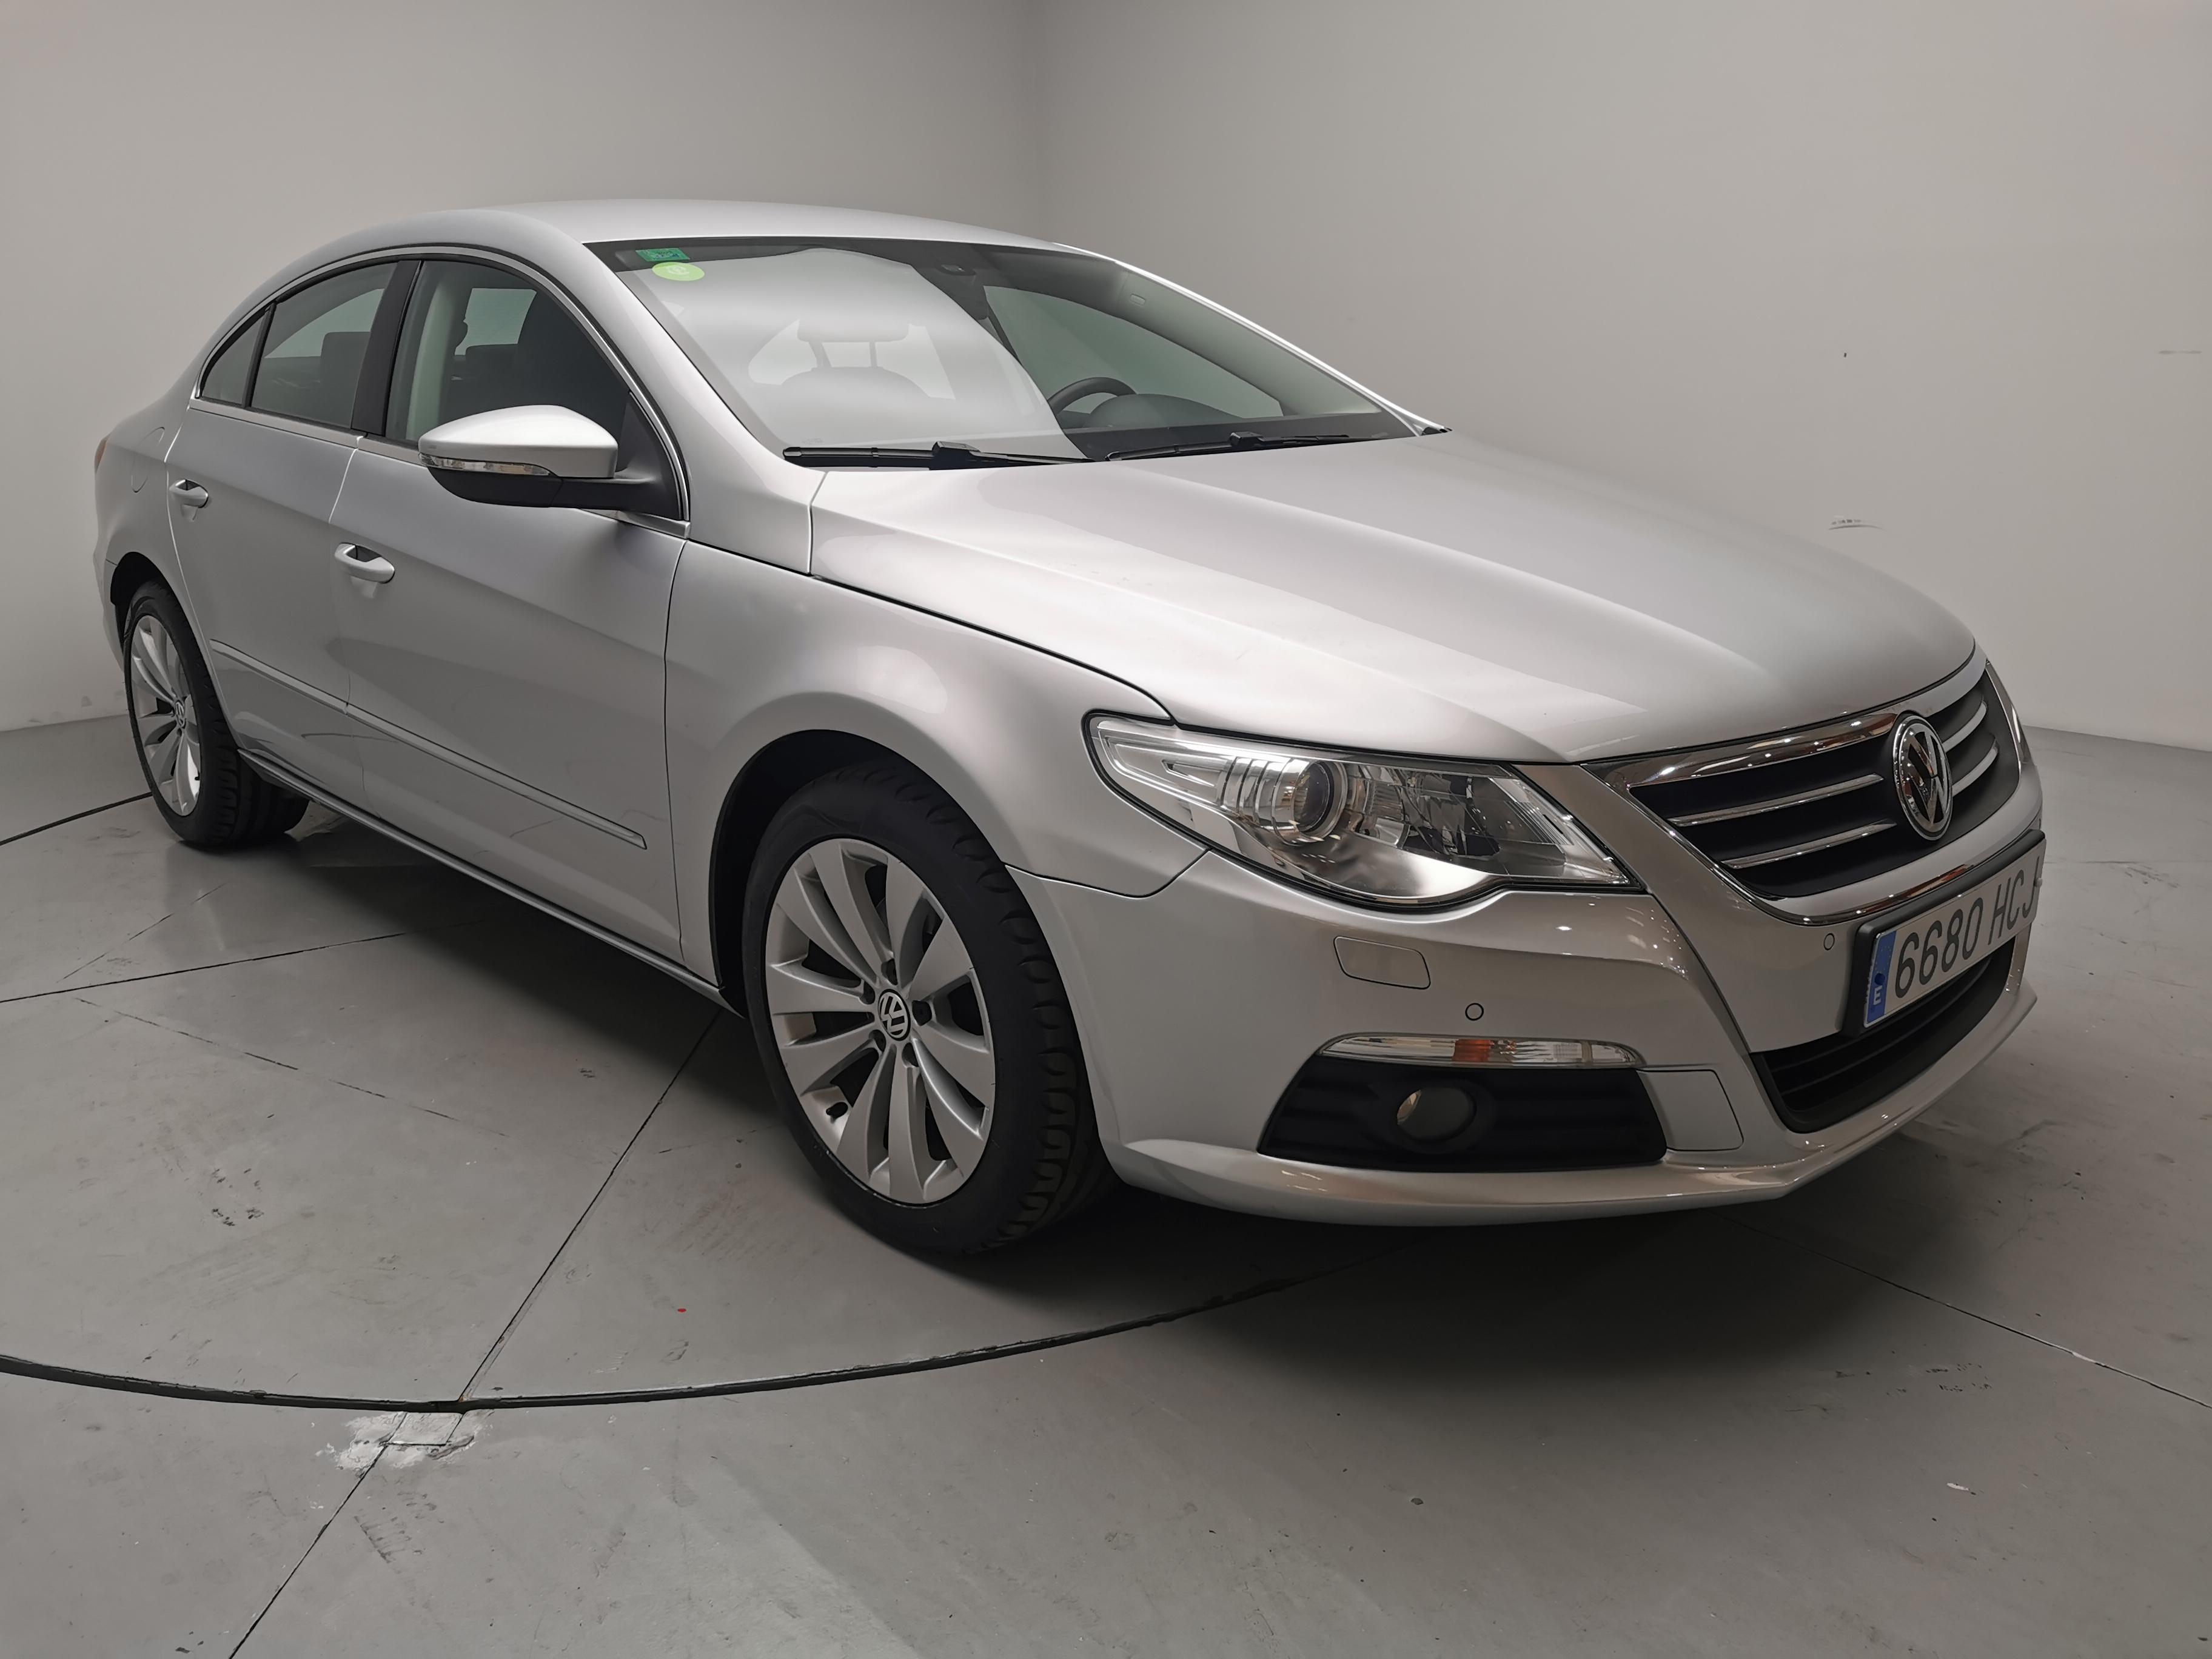 Volkswagen Passat CC ocasión segunda mano 2011 Diésel por 11.500€ en Málaga